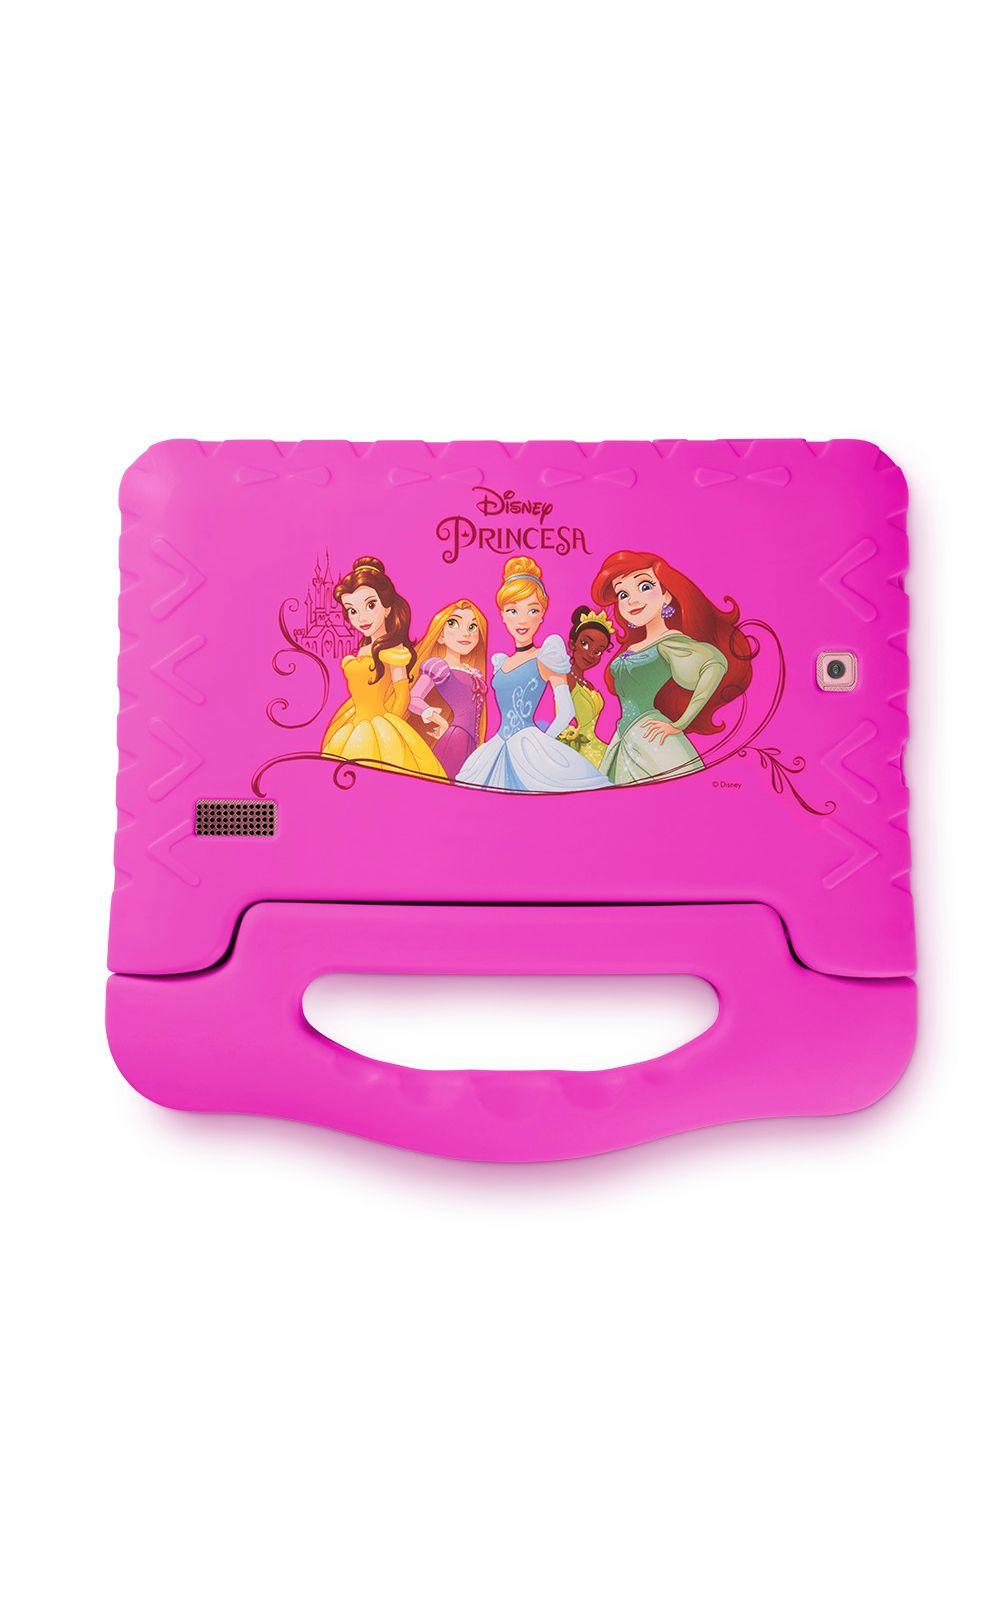 Foto 2 - Tablet Multilaser Disney Princesas Plus 16GB Tela 7 Pol. Quad Core Dual Câmera Rosa- NB308